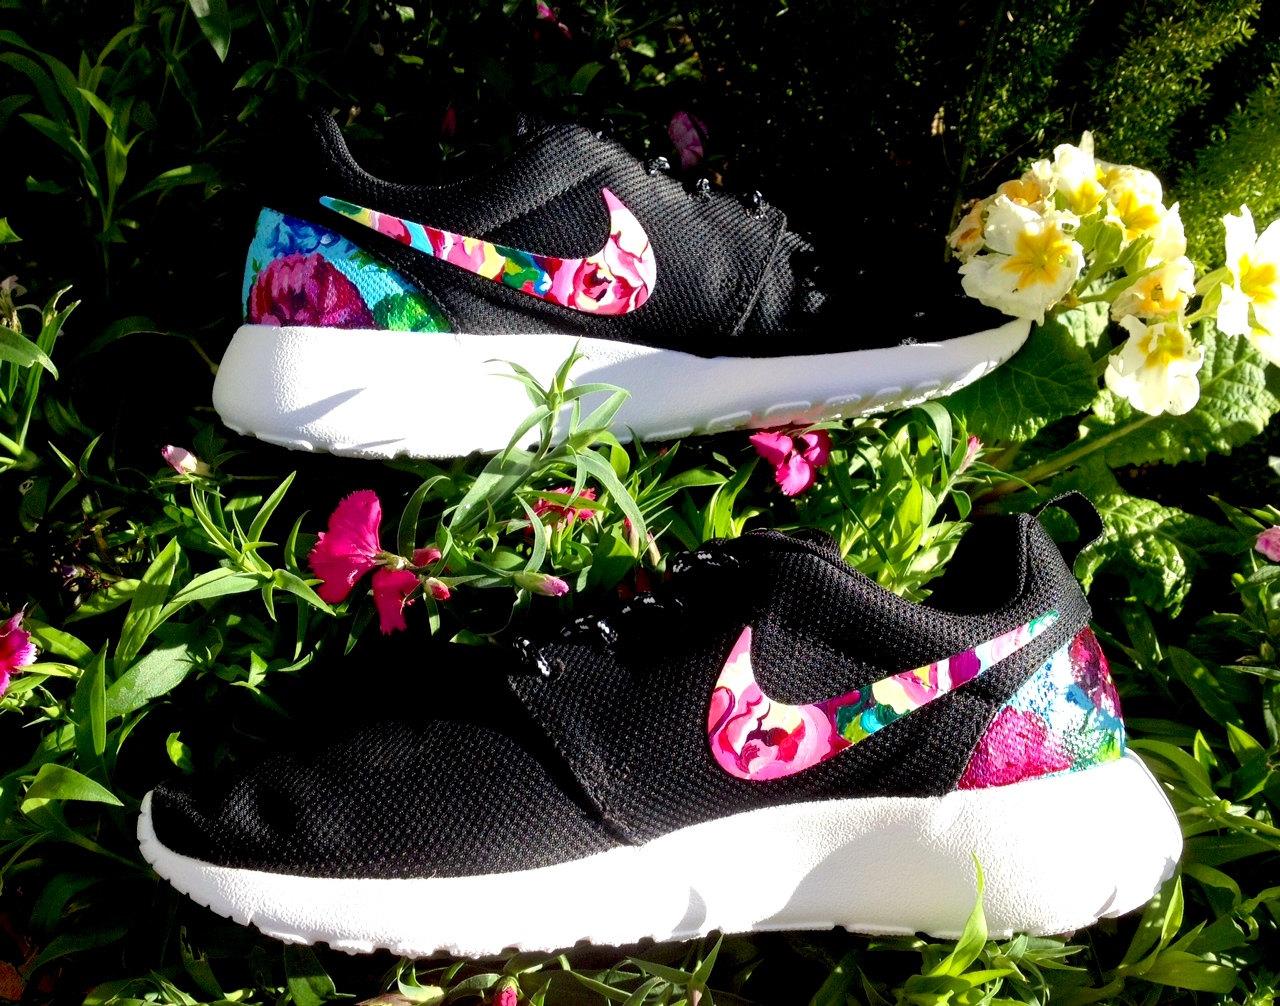 Closeout Nike Roshe Floral - Nike Roshe Run Womens Trainers Shoes Uk Leisure Vip Store Nike Sport